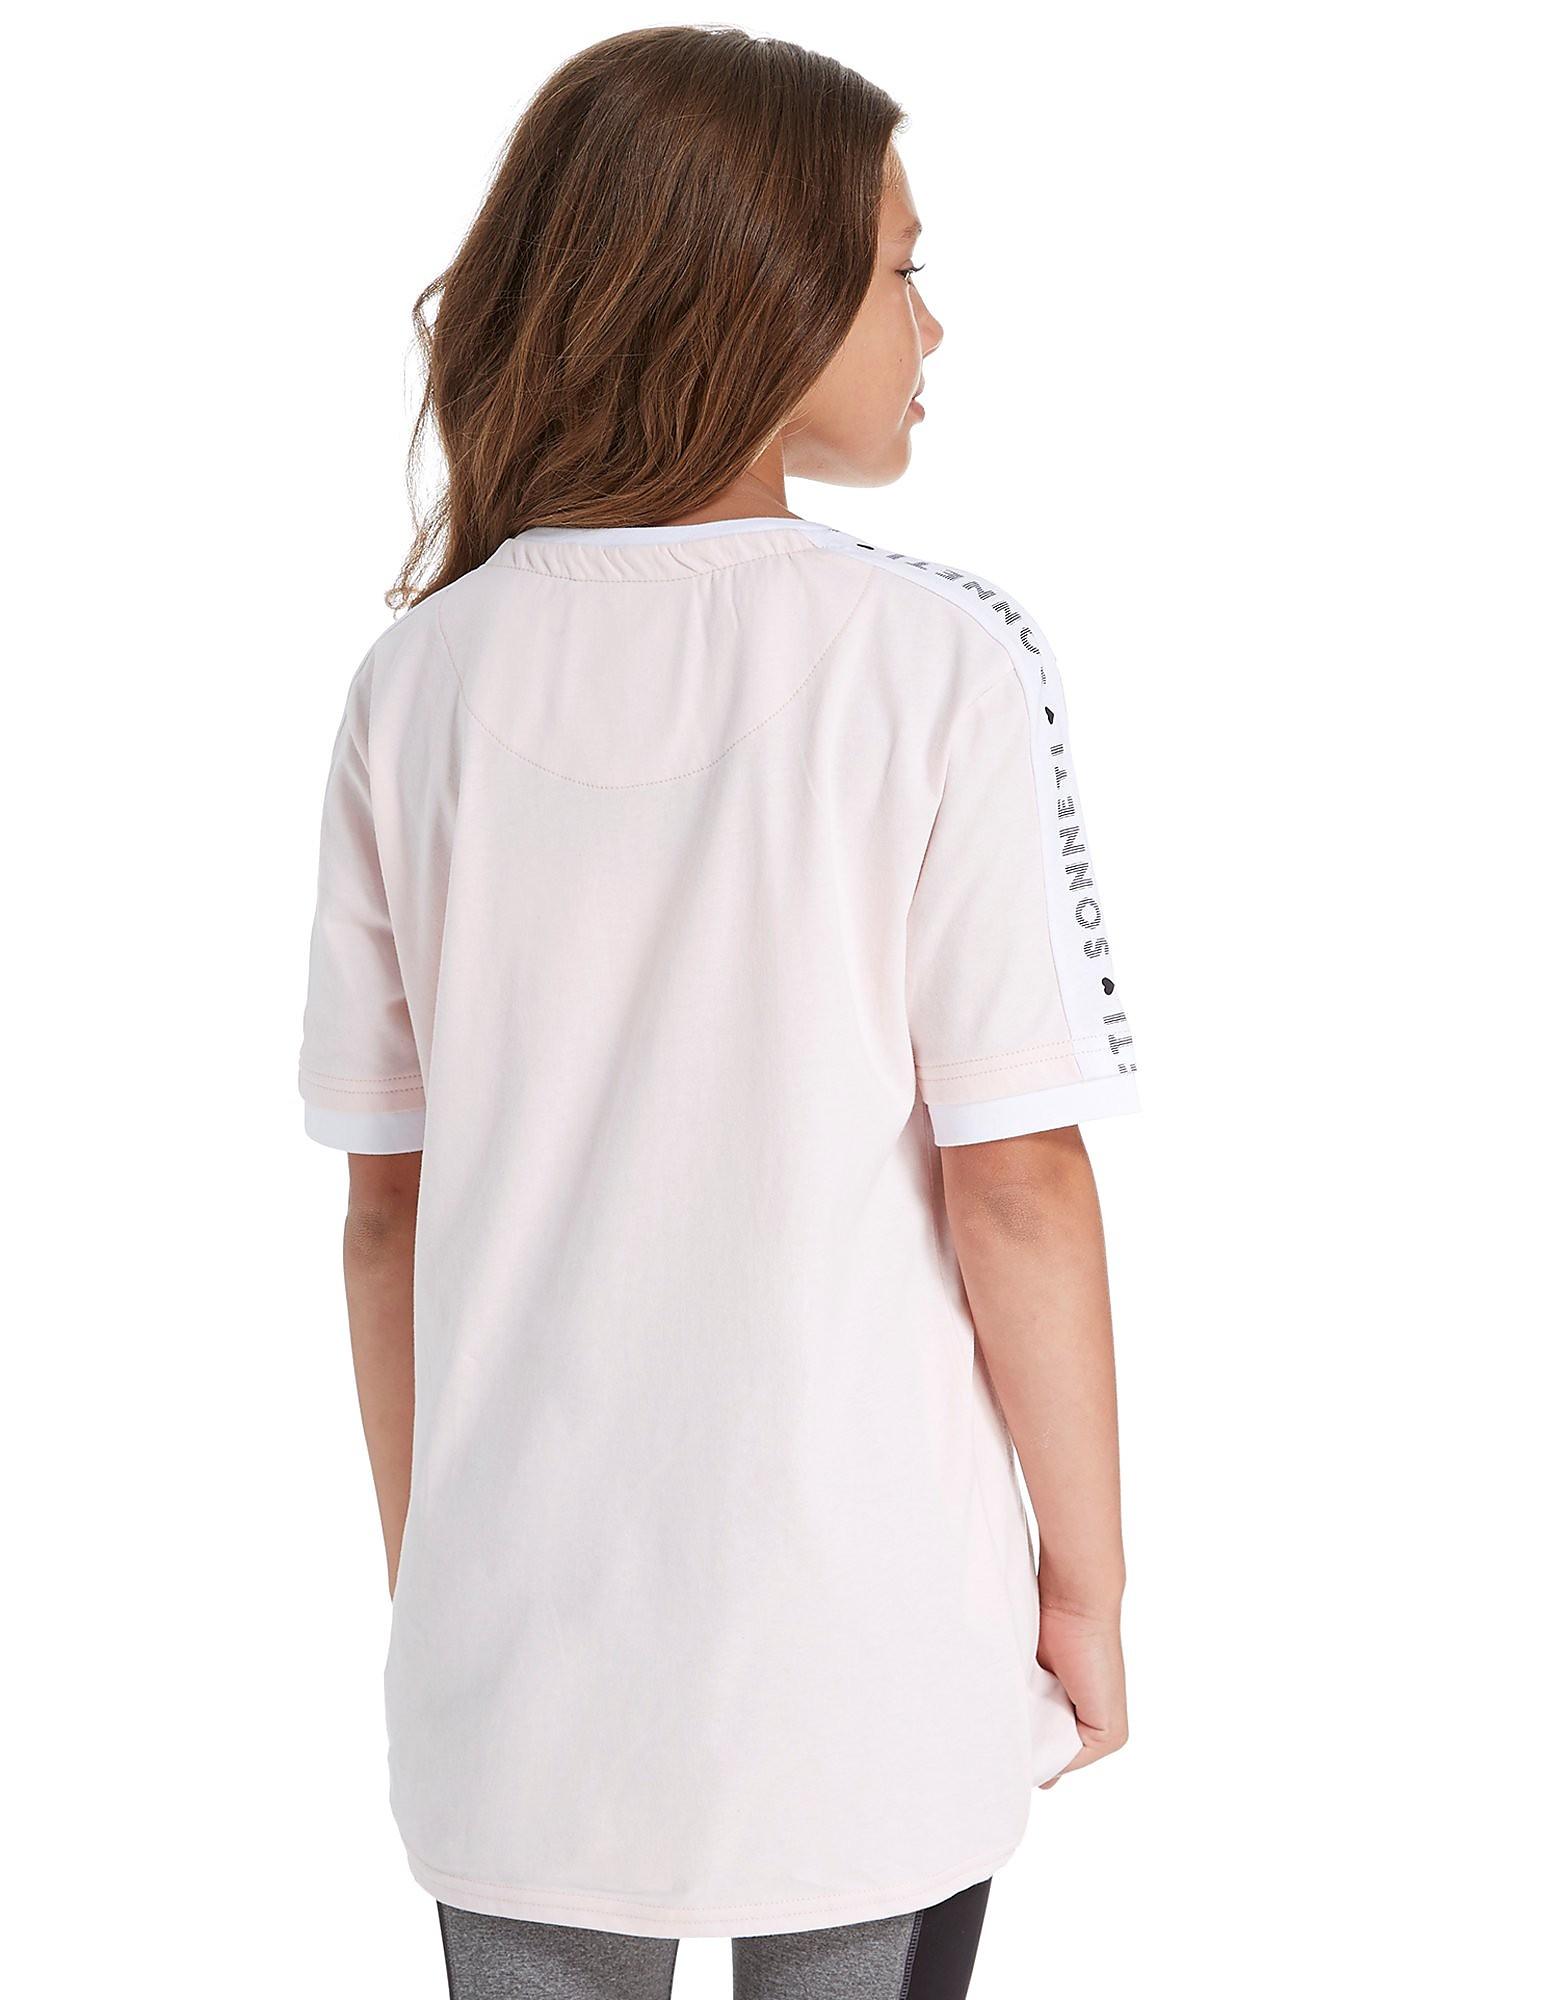 Sonneti Girls' Panel Boyfriend T-Shirt Junior